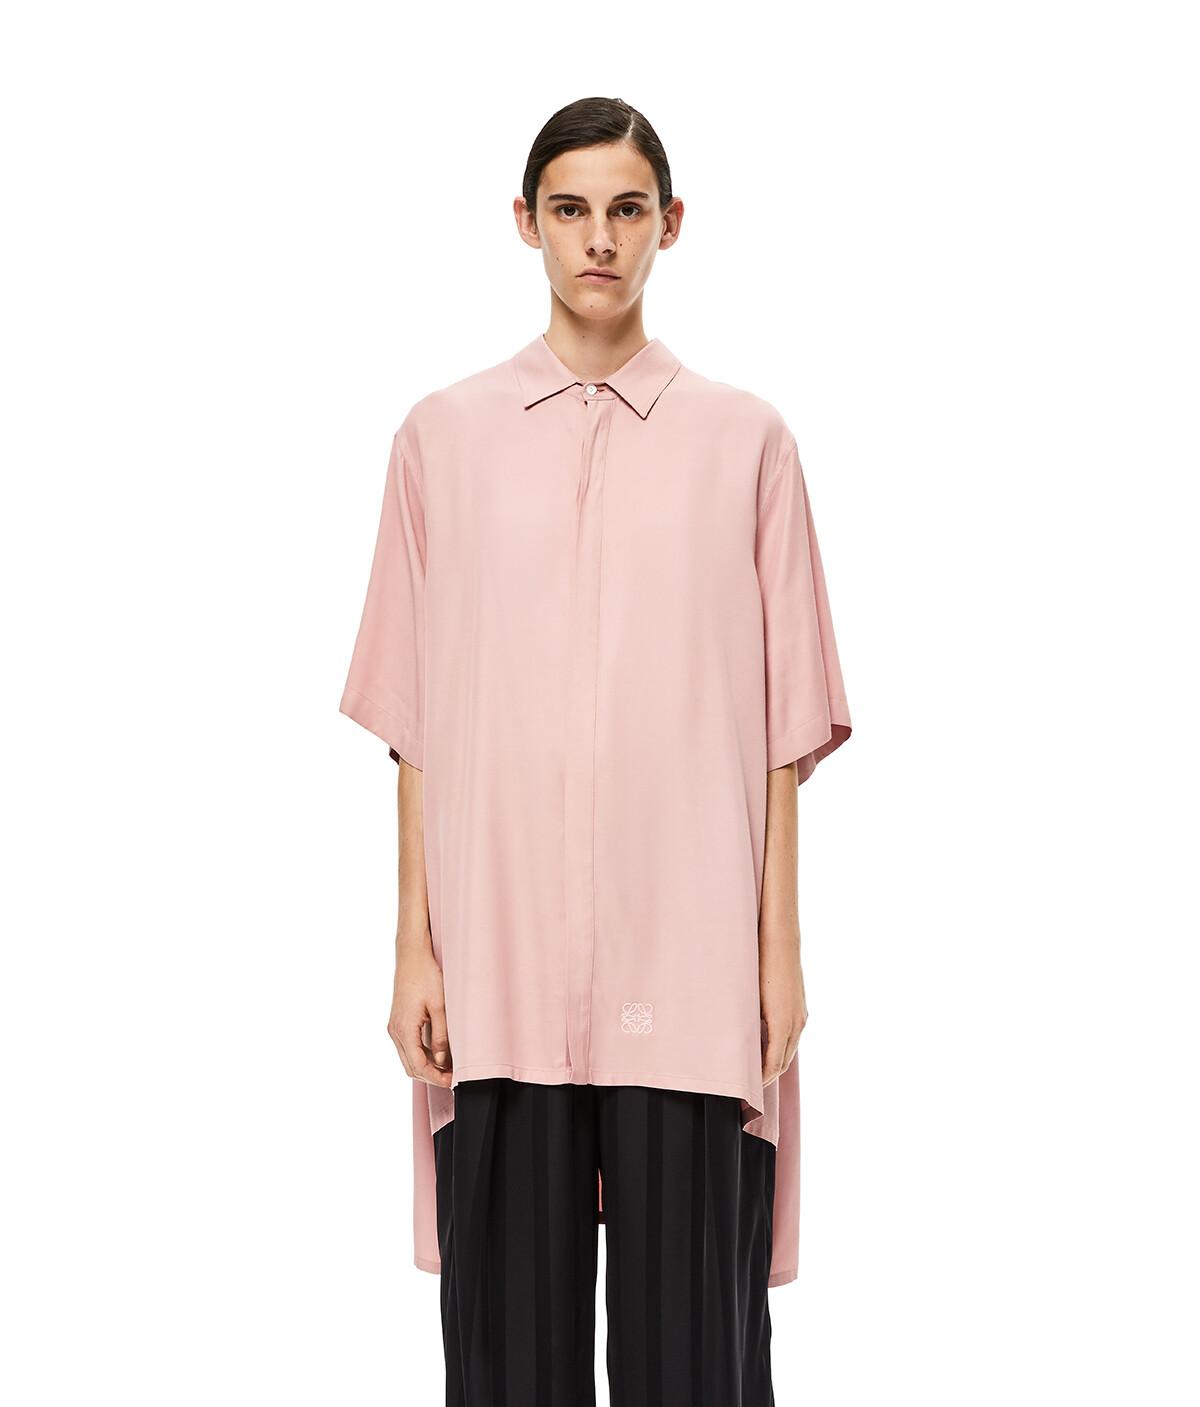 LOEWE Oversize Short Sleeve Shirt Light Pink front